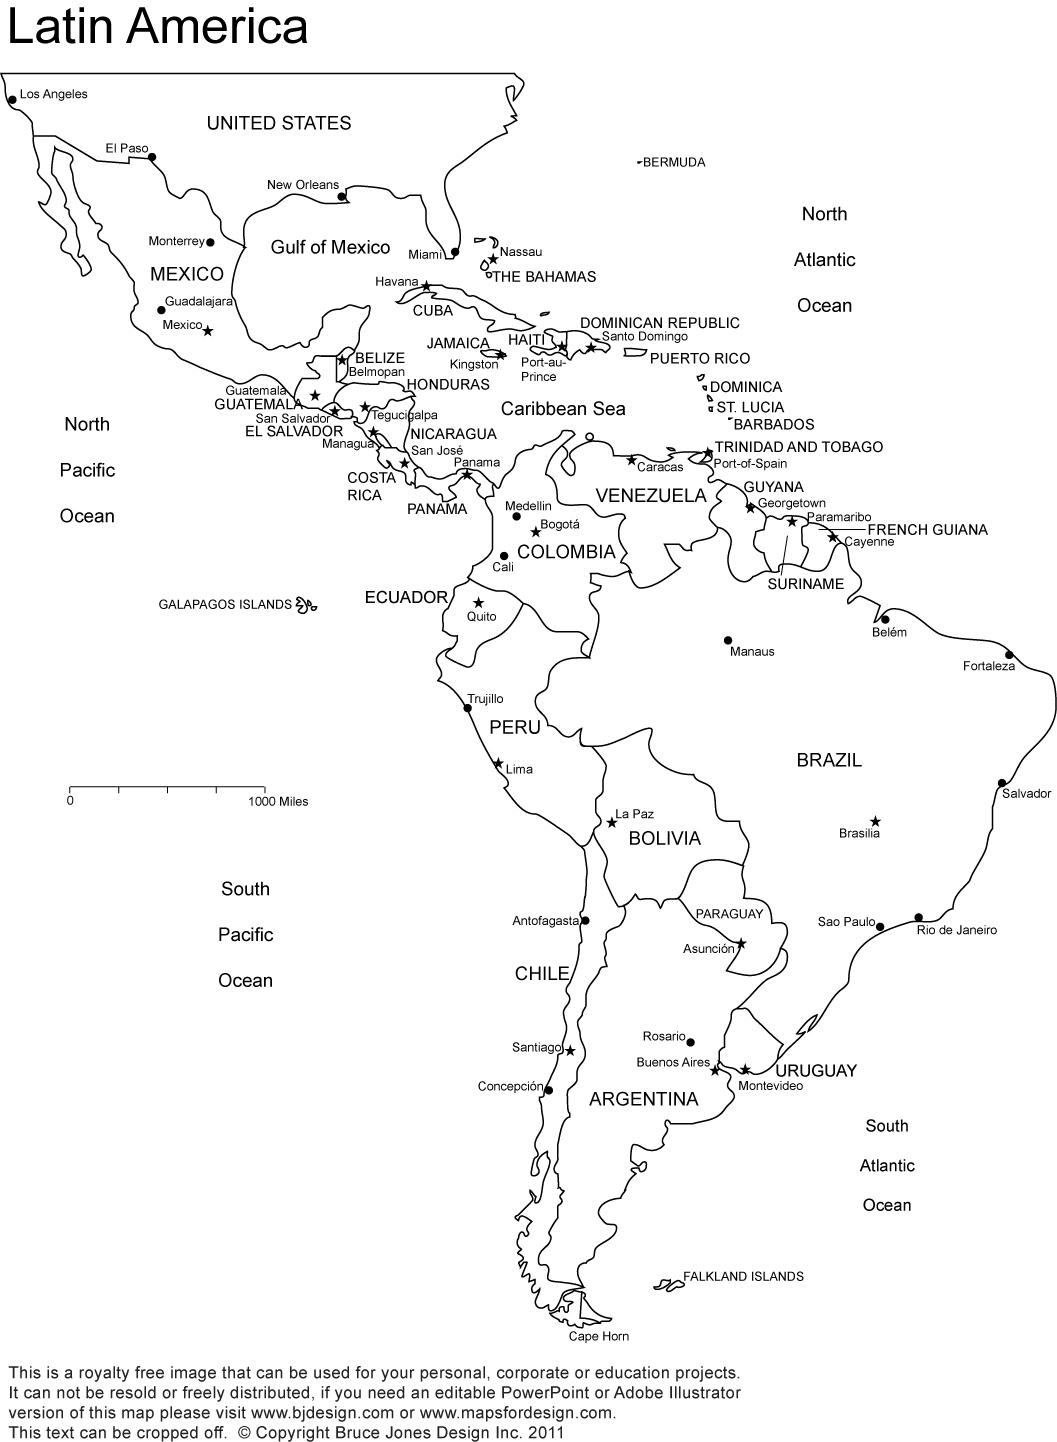 World Regional Printable, Blank Maps • Royalty Free, Jpg - Free Printable Map Of North America